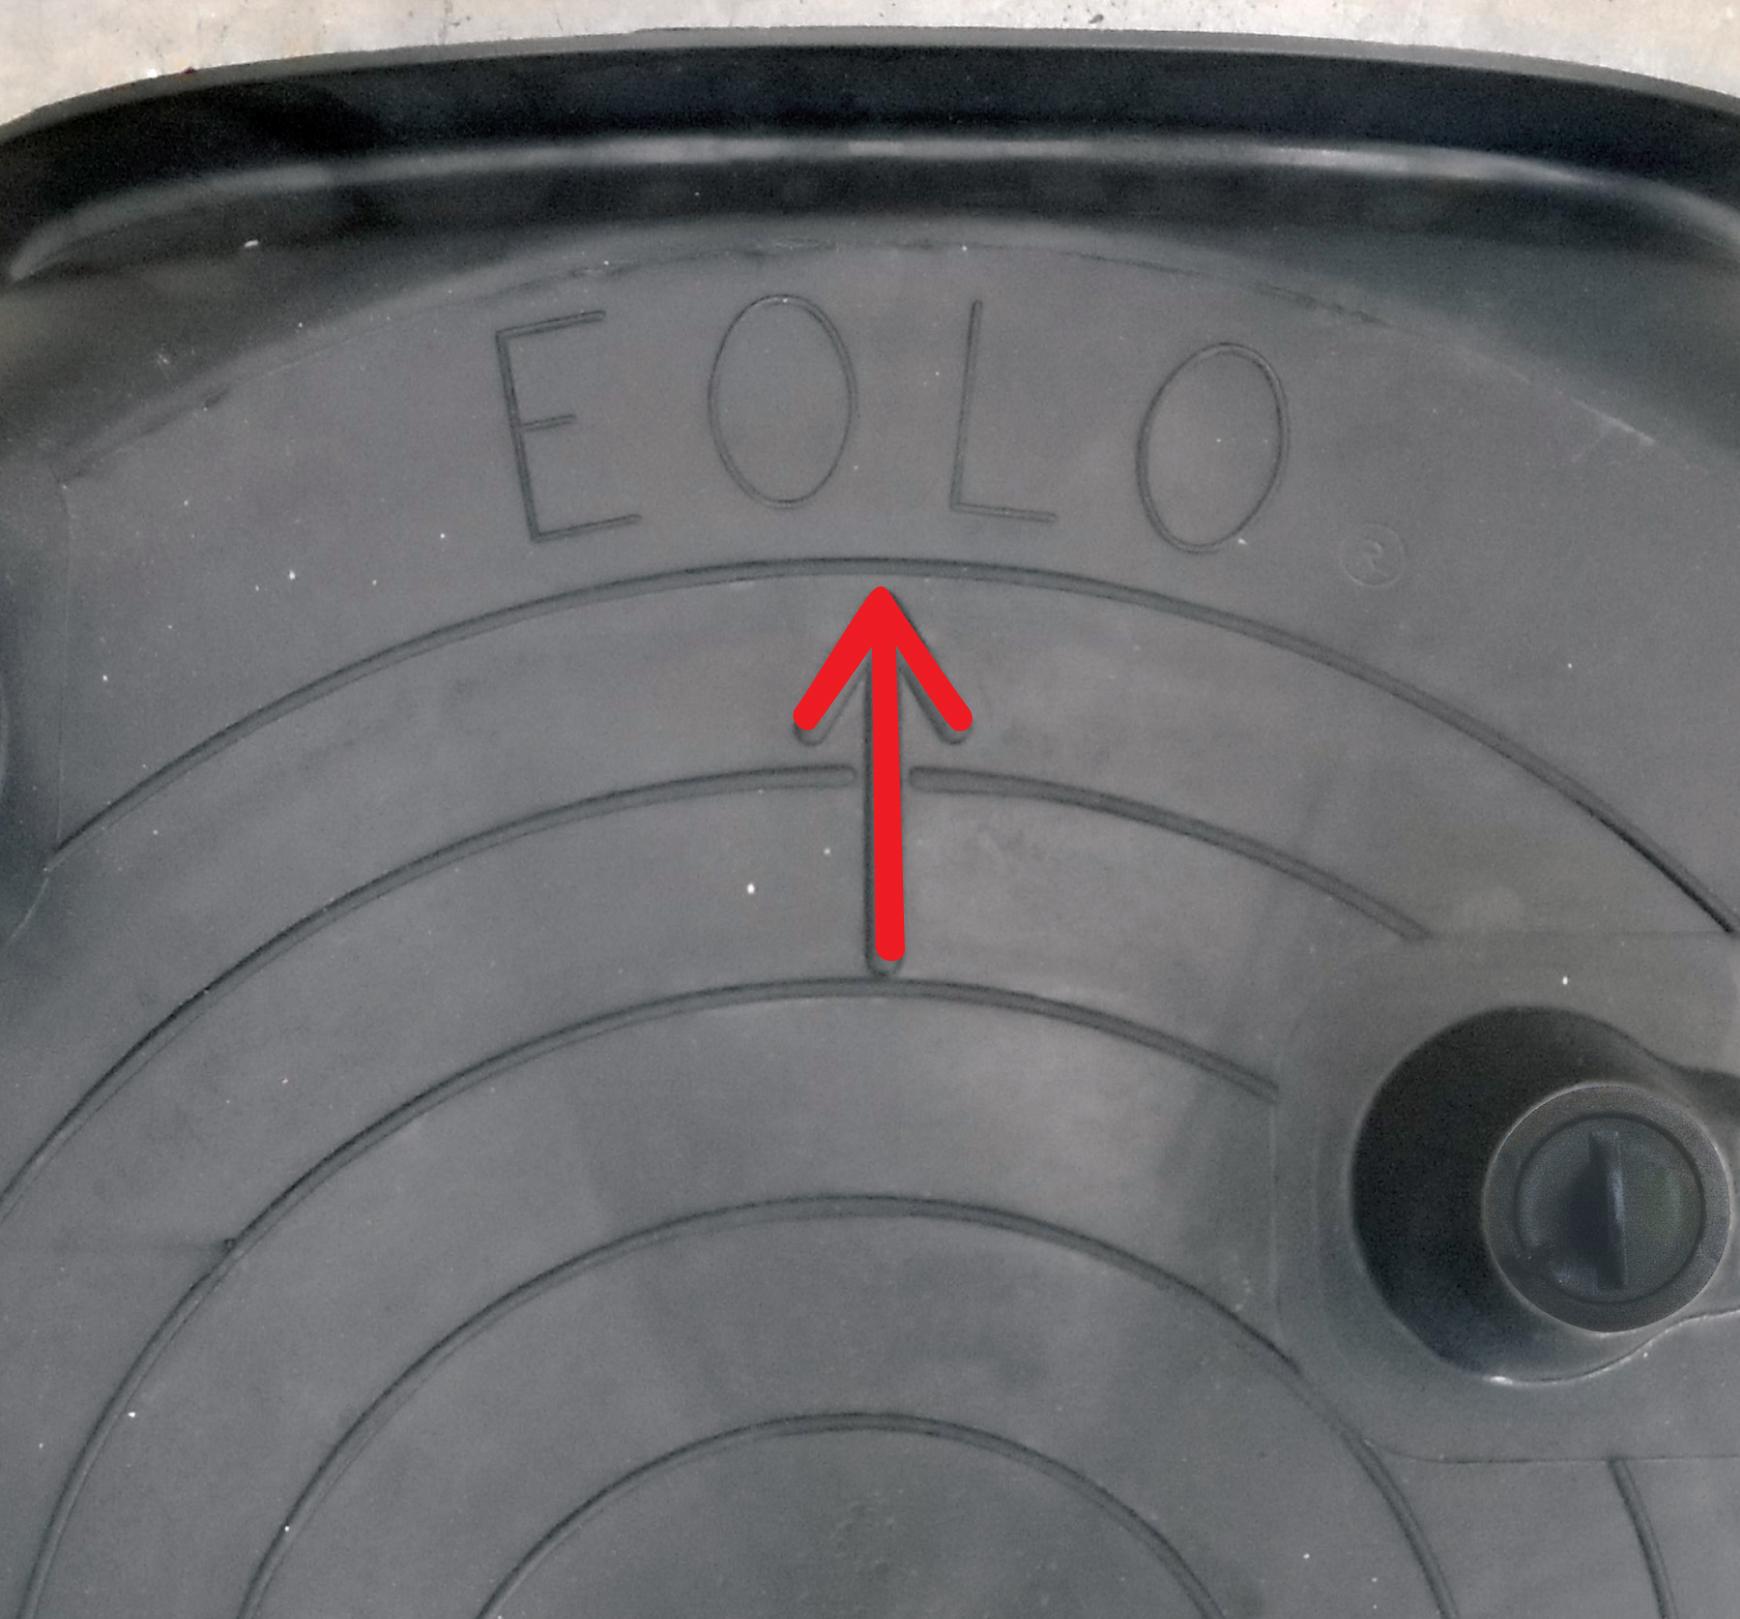 eolo-posa-vespaio